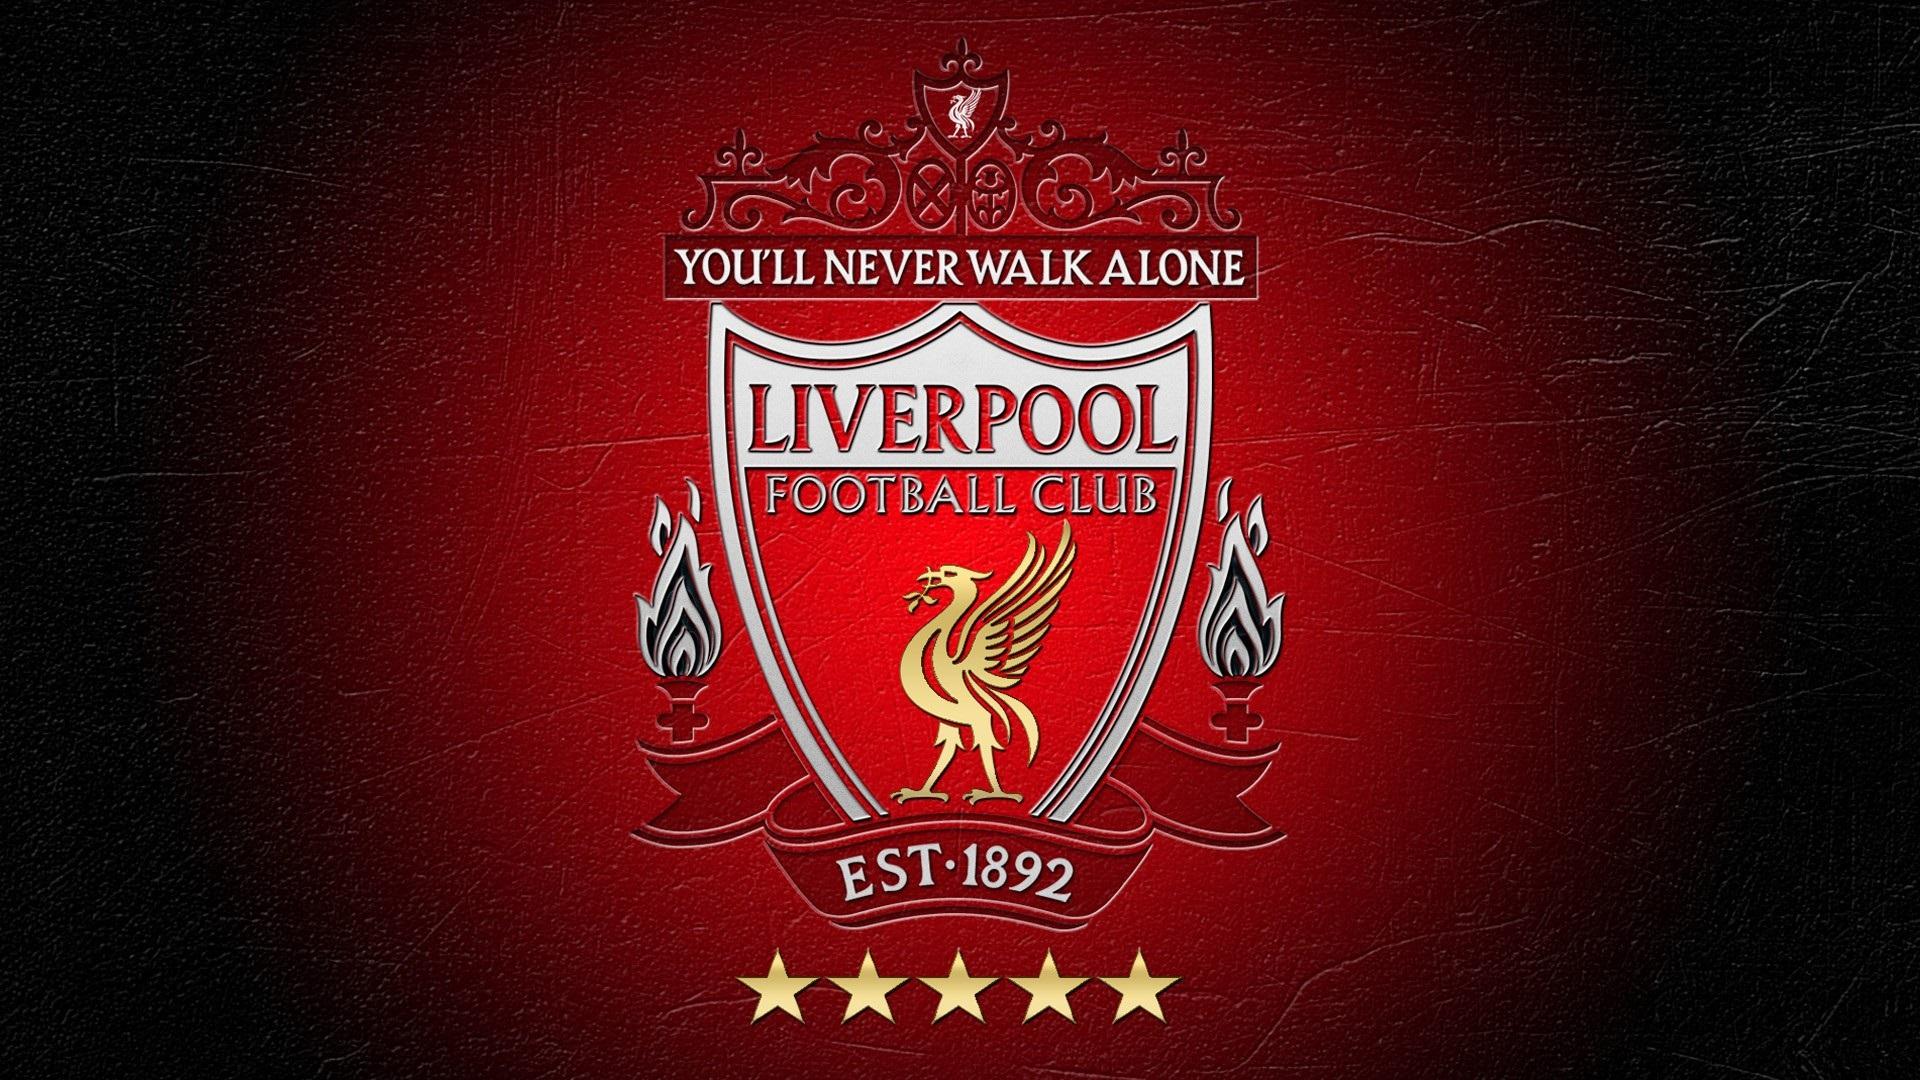 Liverpool Desktop Wallpapers 2019 Football Wallpaper 1920x1080